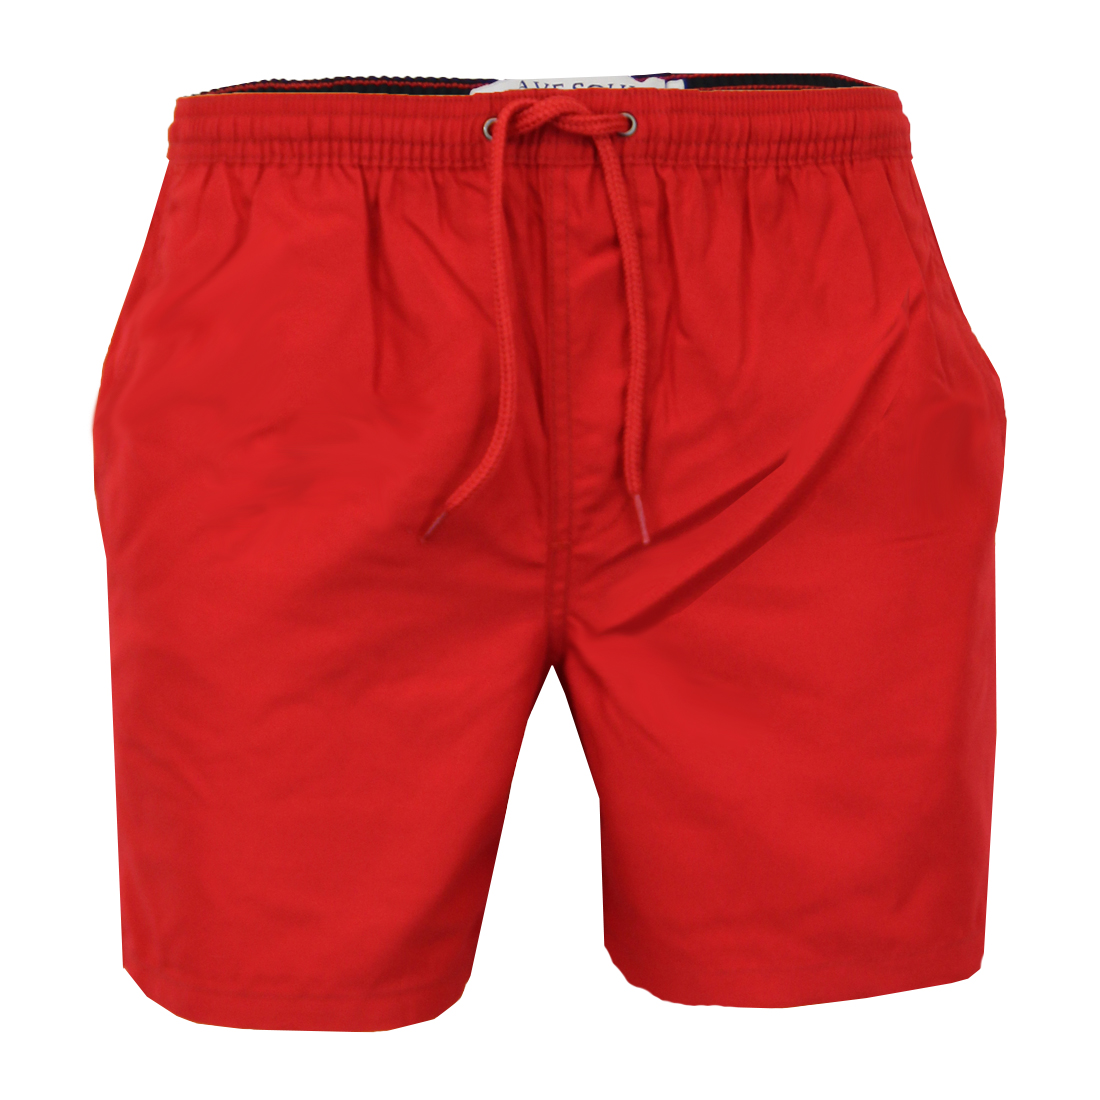 Mens Brave Soul Sparks Board Shorts Lined Swim Trunks Board Shorts